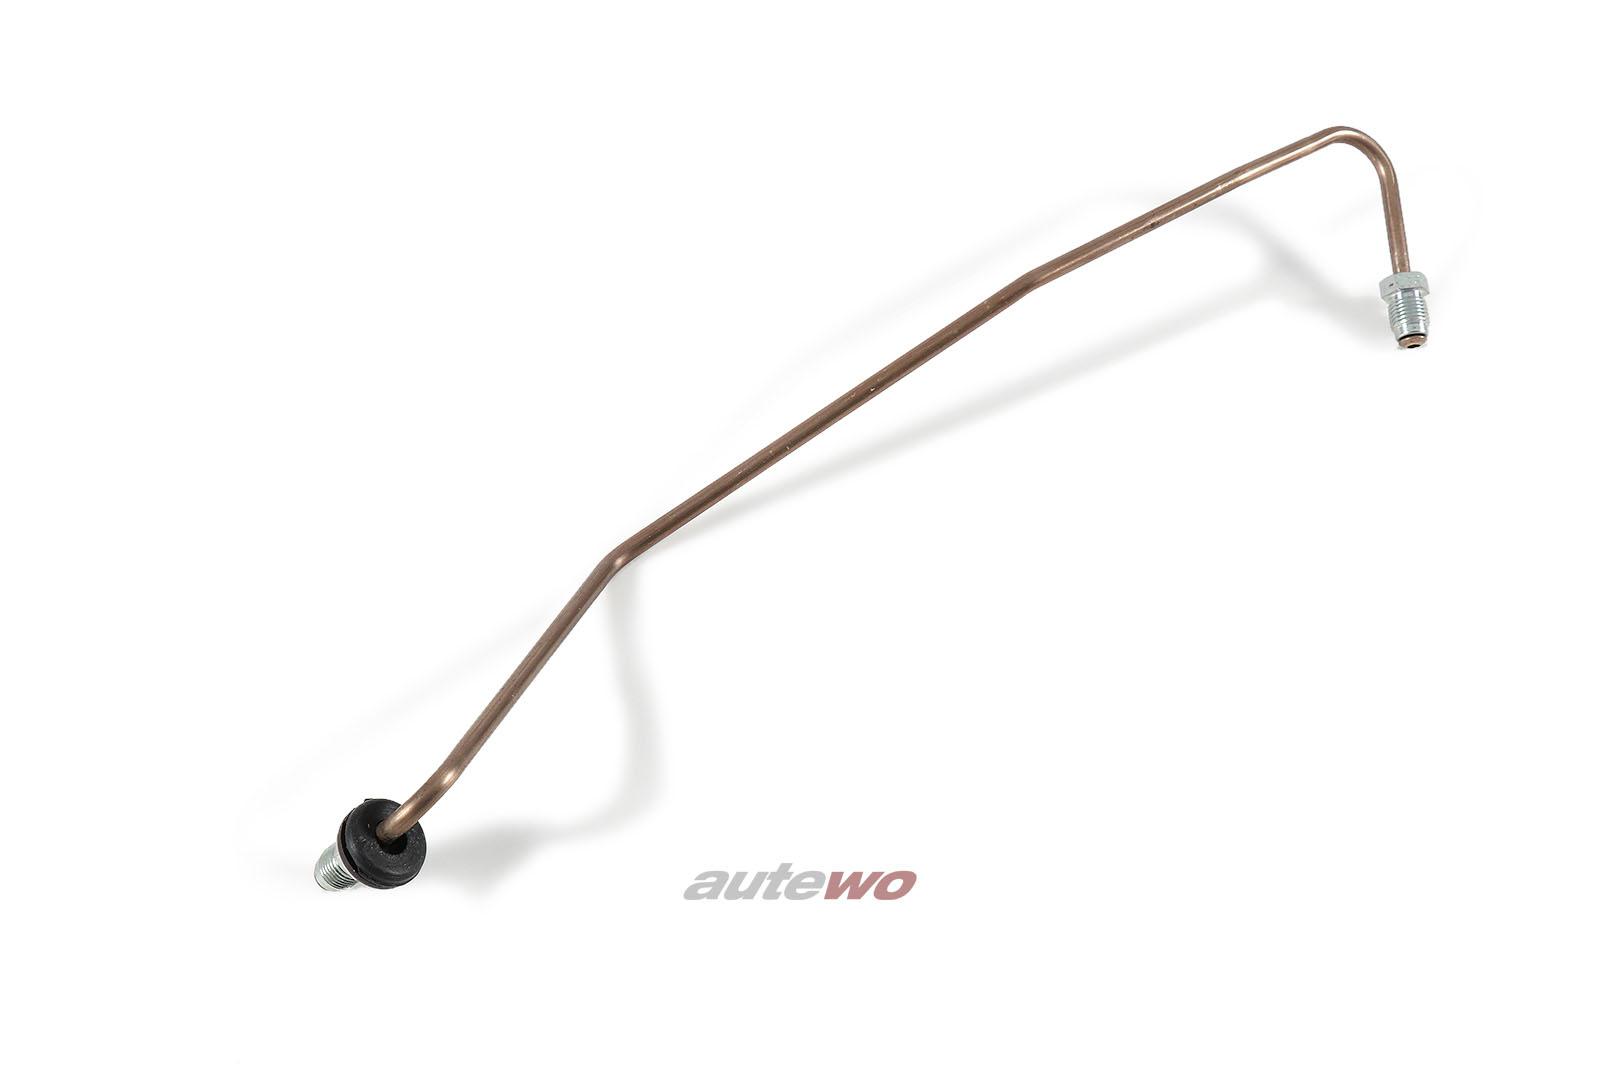 8A0611721 NEU Audi RS2 P1 Bremsrohr/Bremsleitung Vorne Links